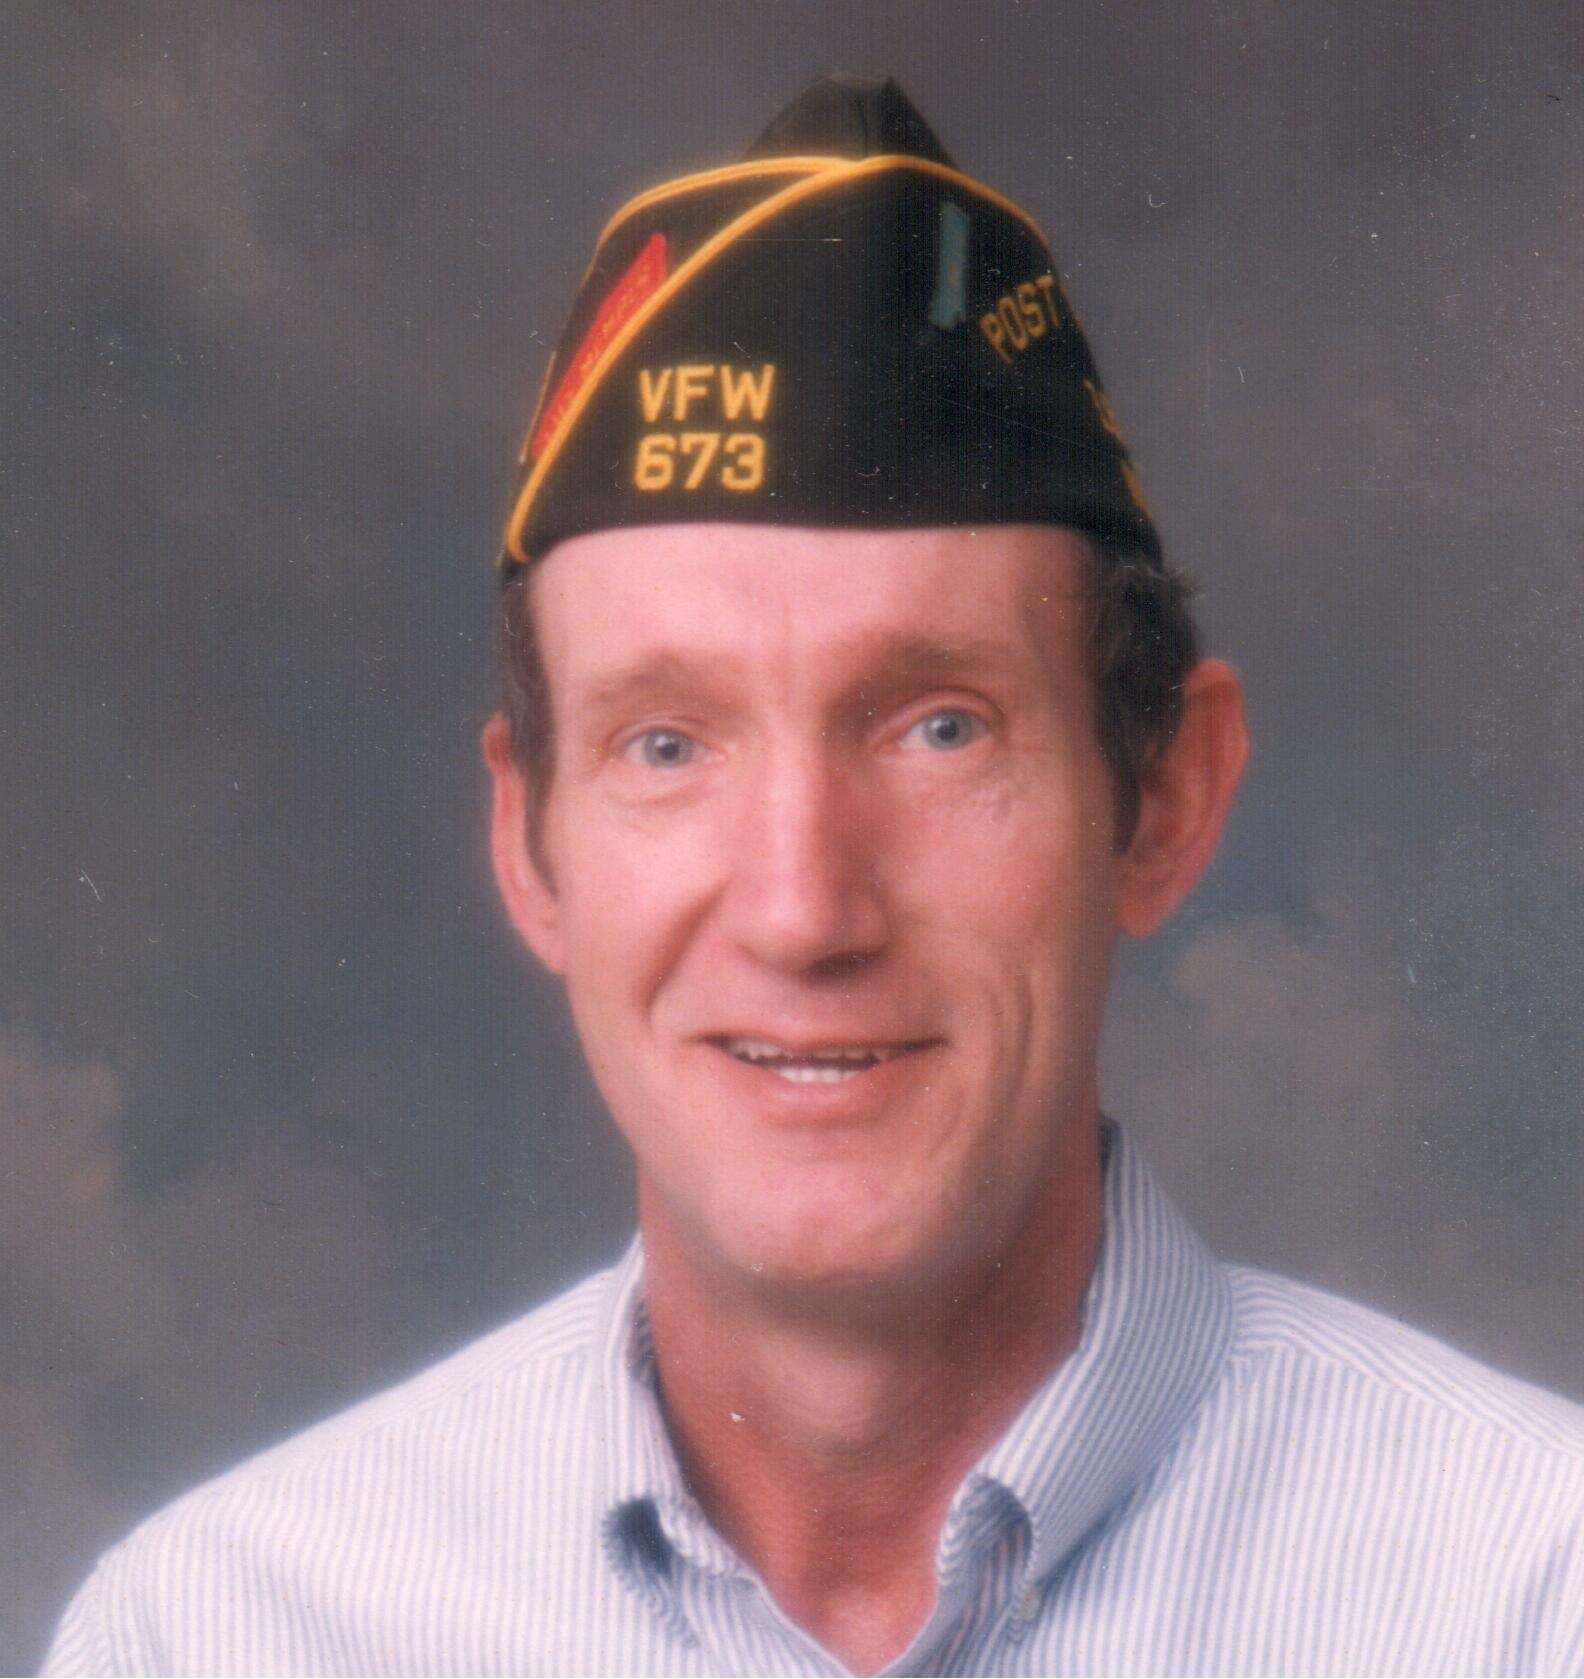 Donald L. Kluesner, age 68 of Jasper